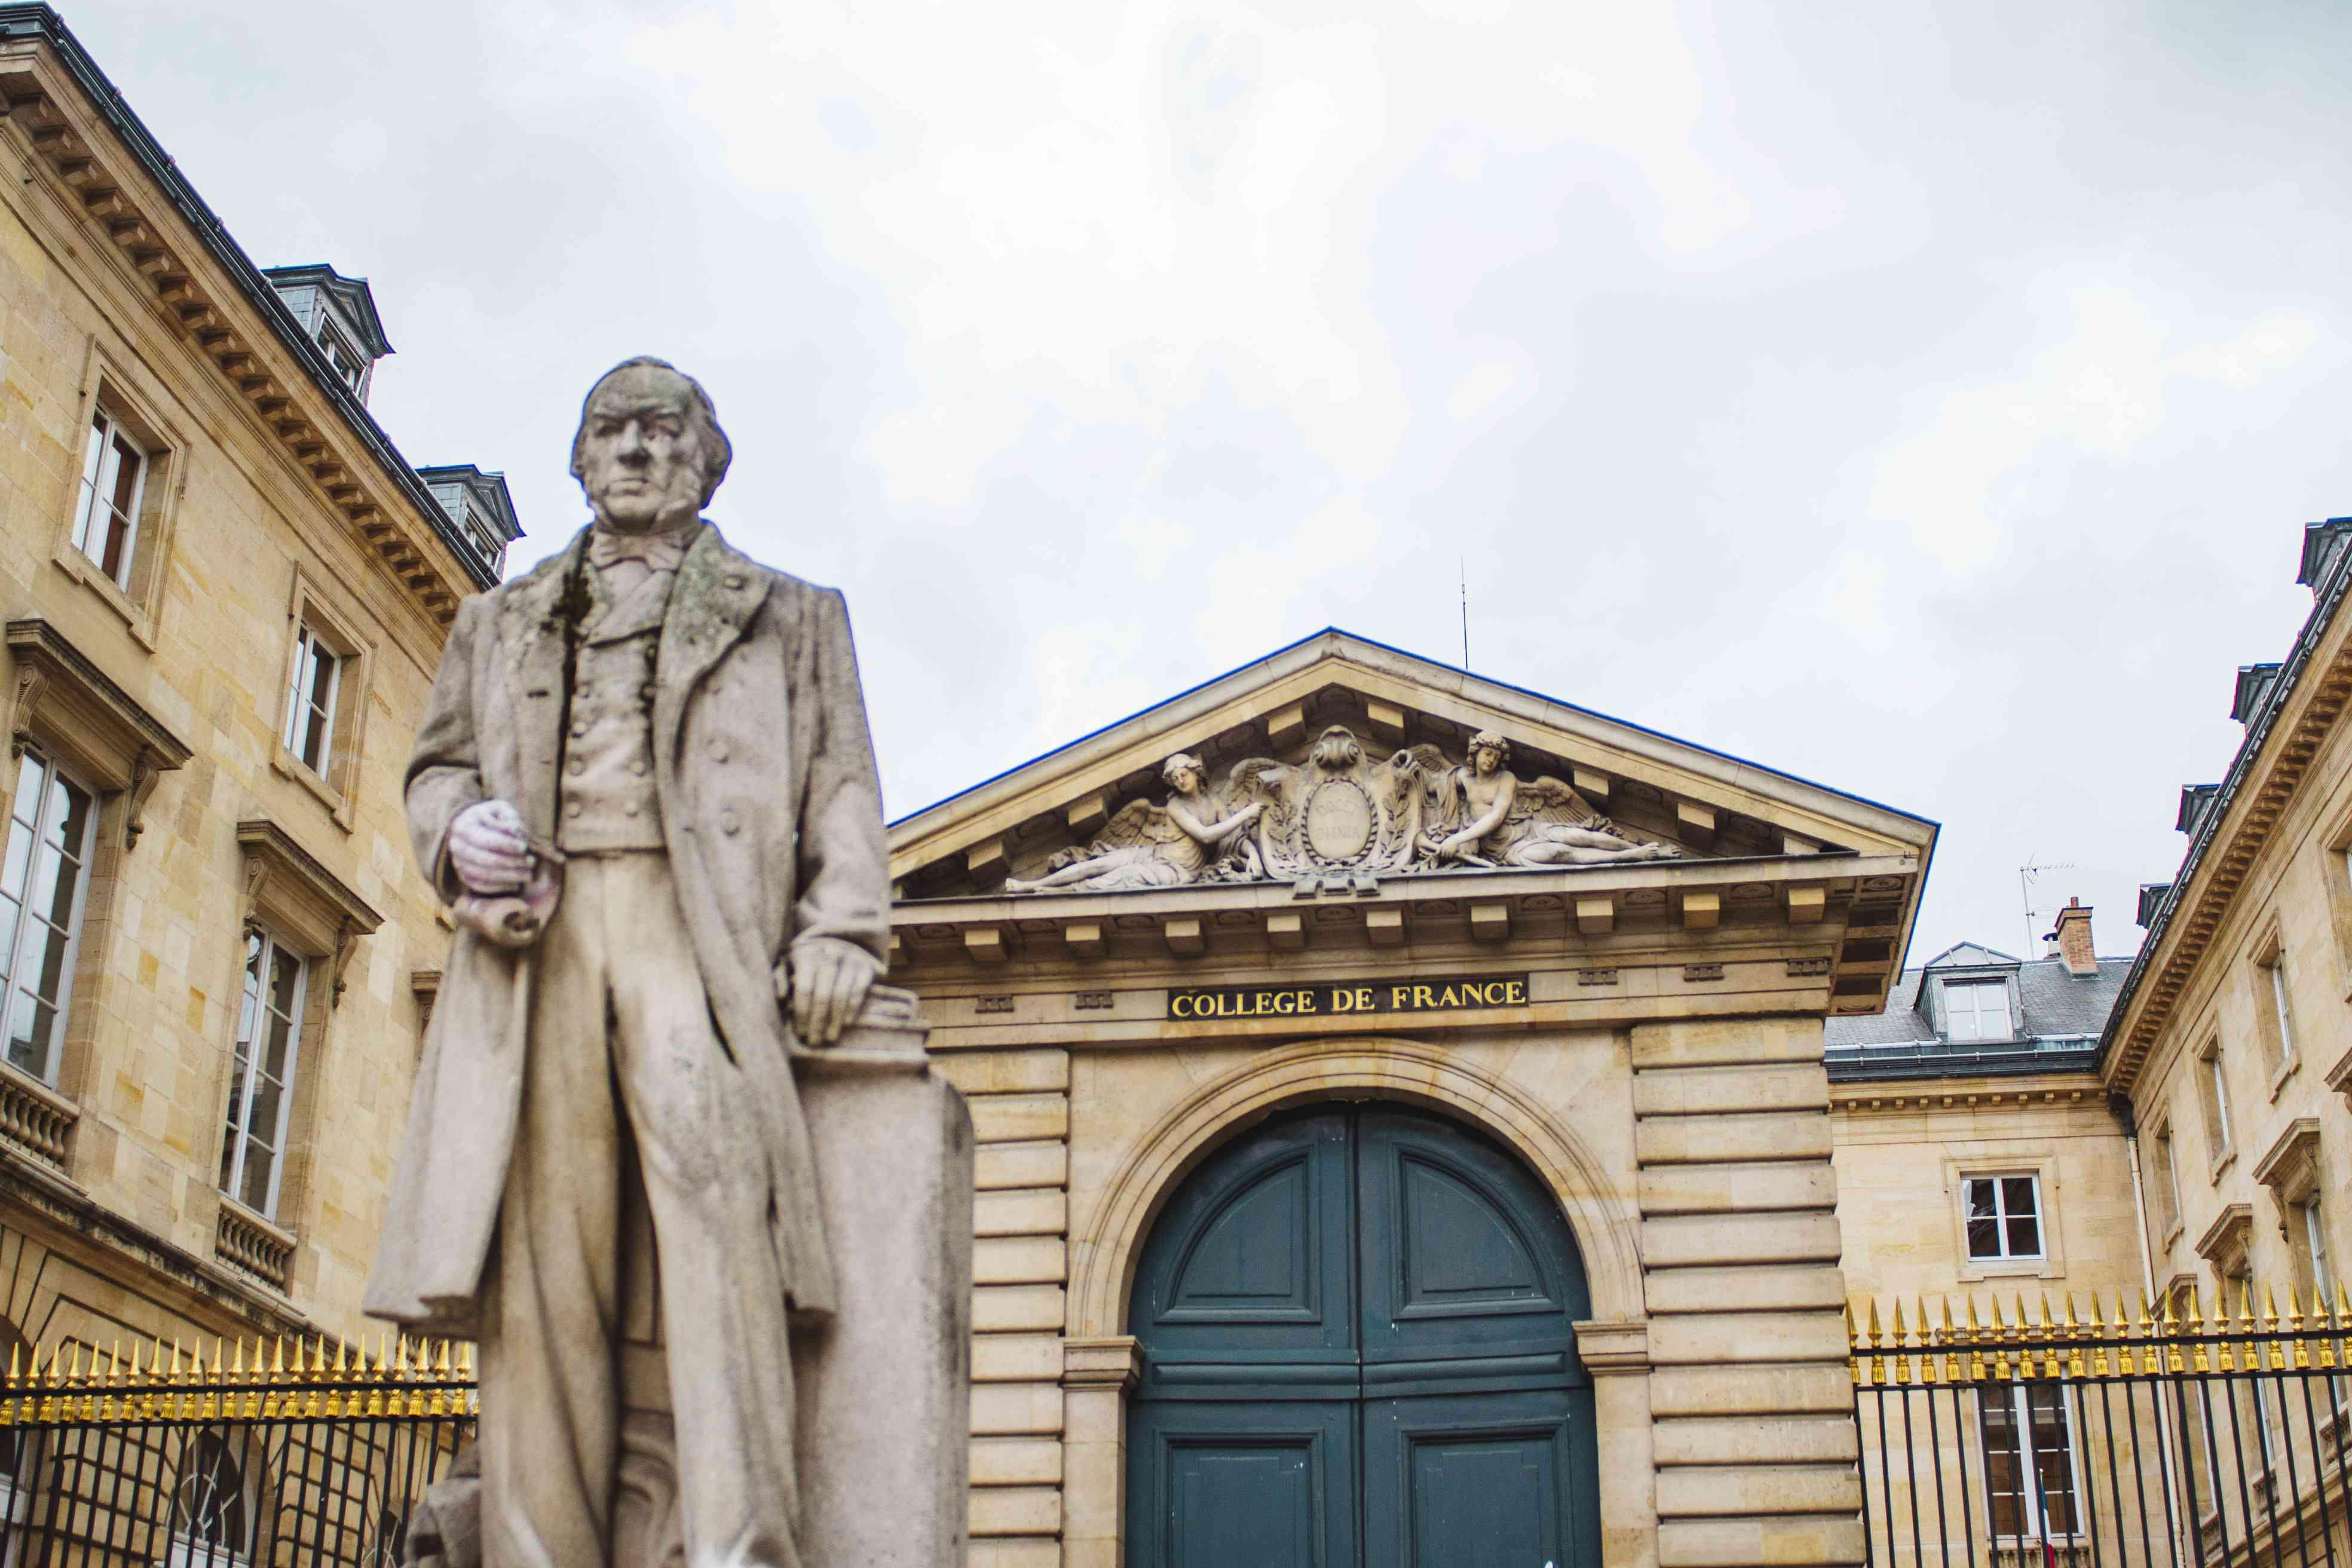 Exterior of College de France